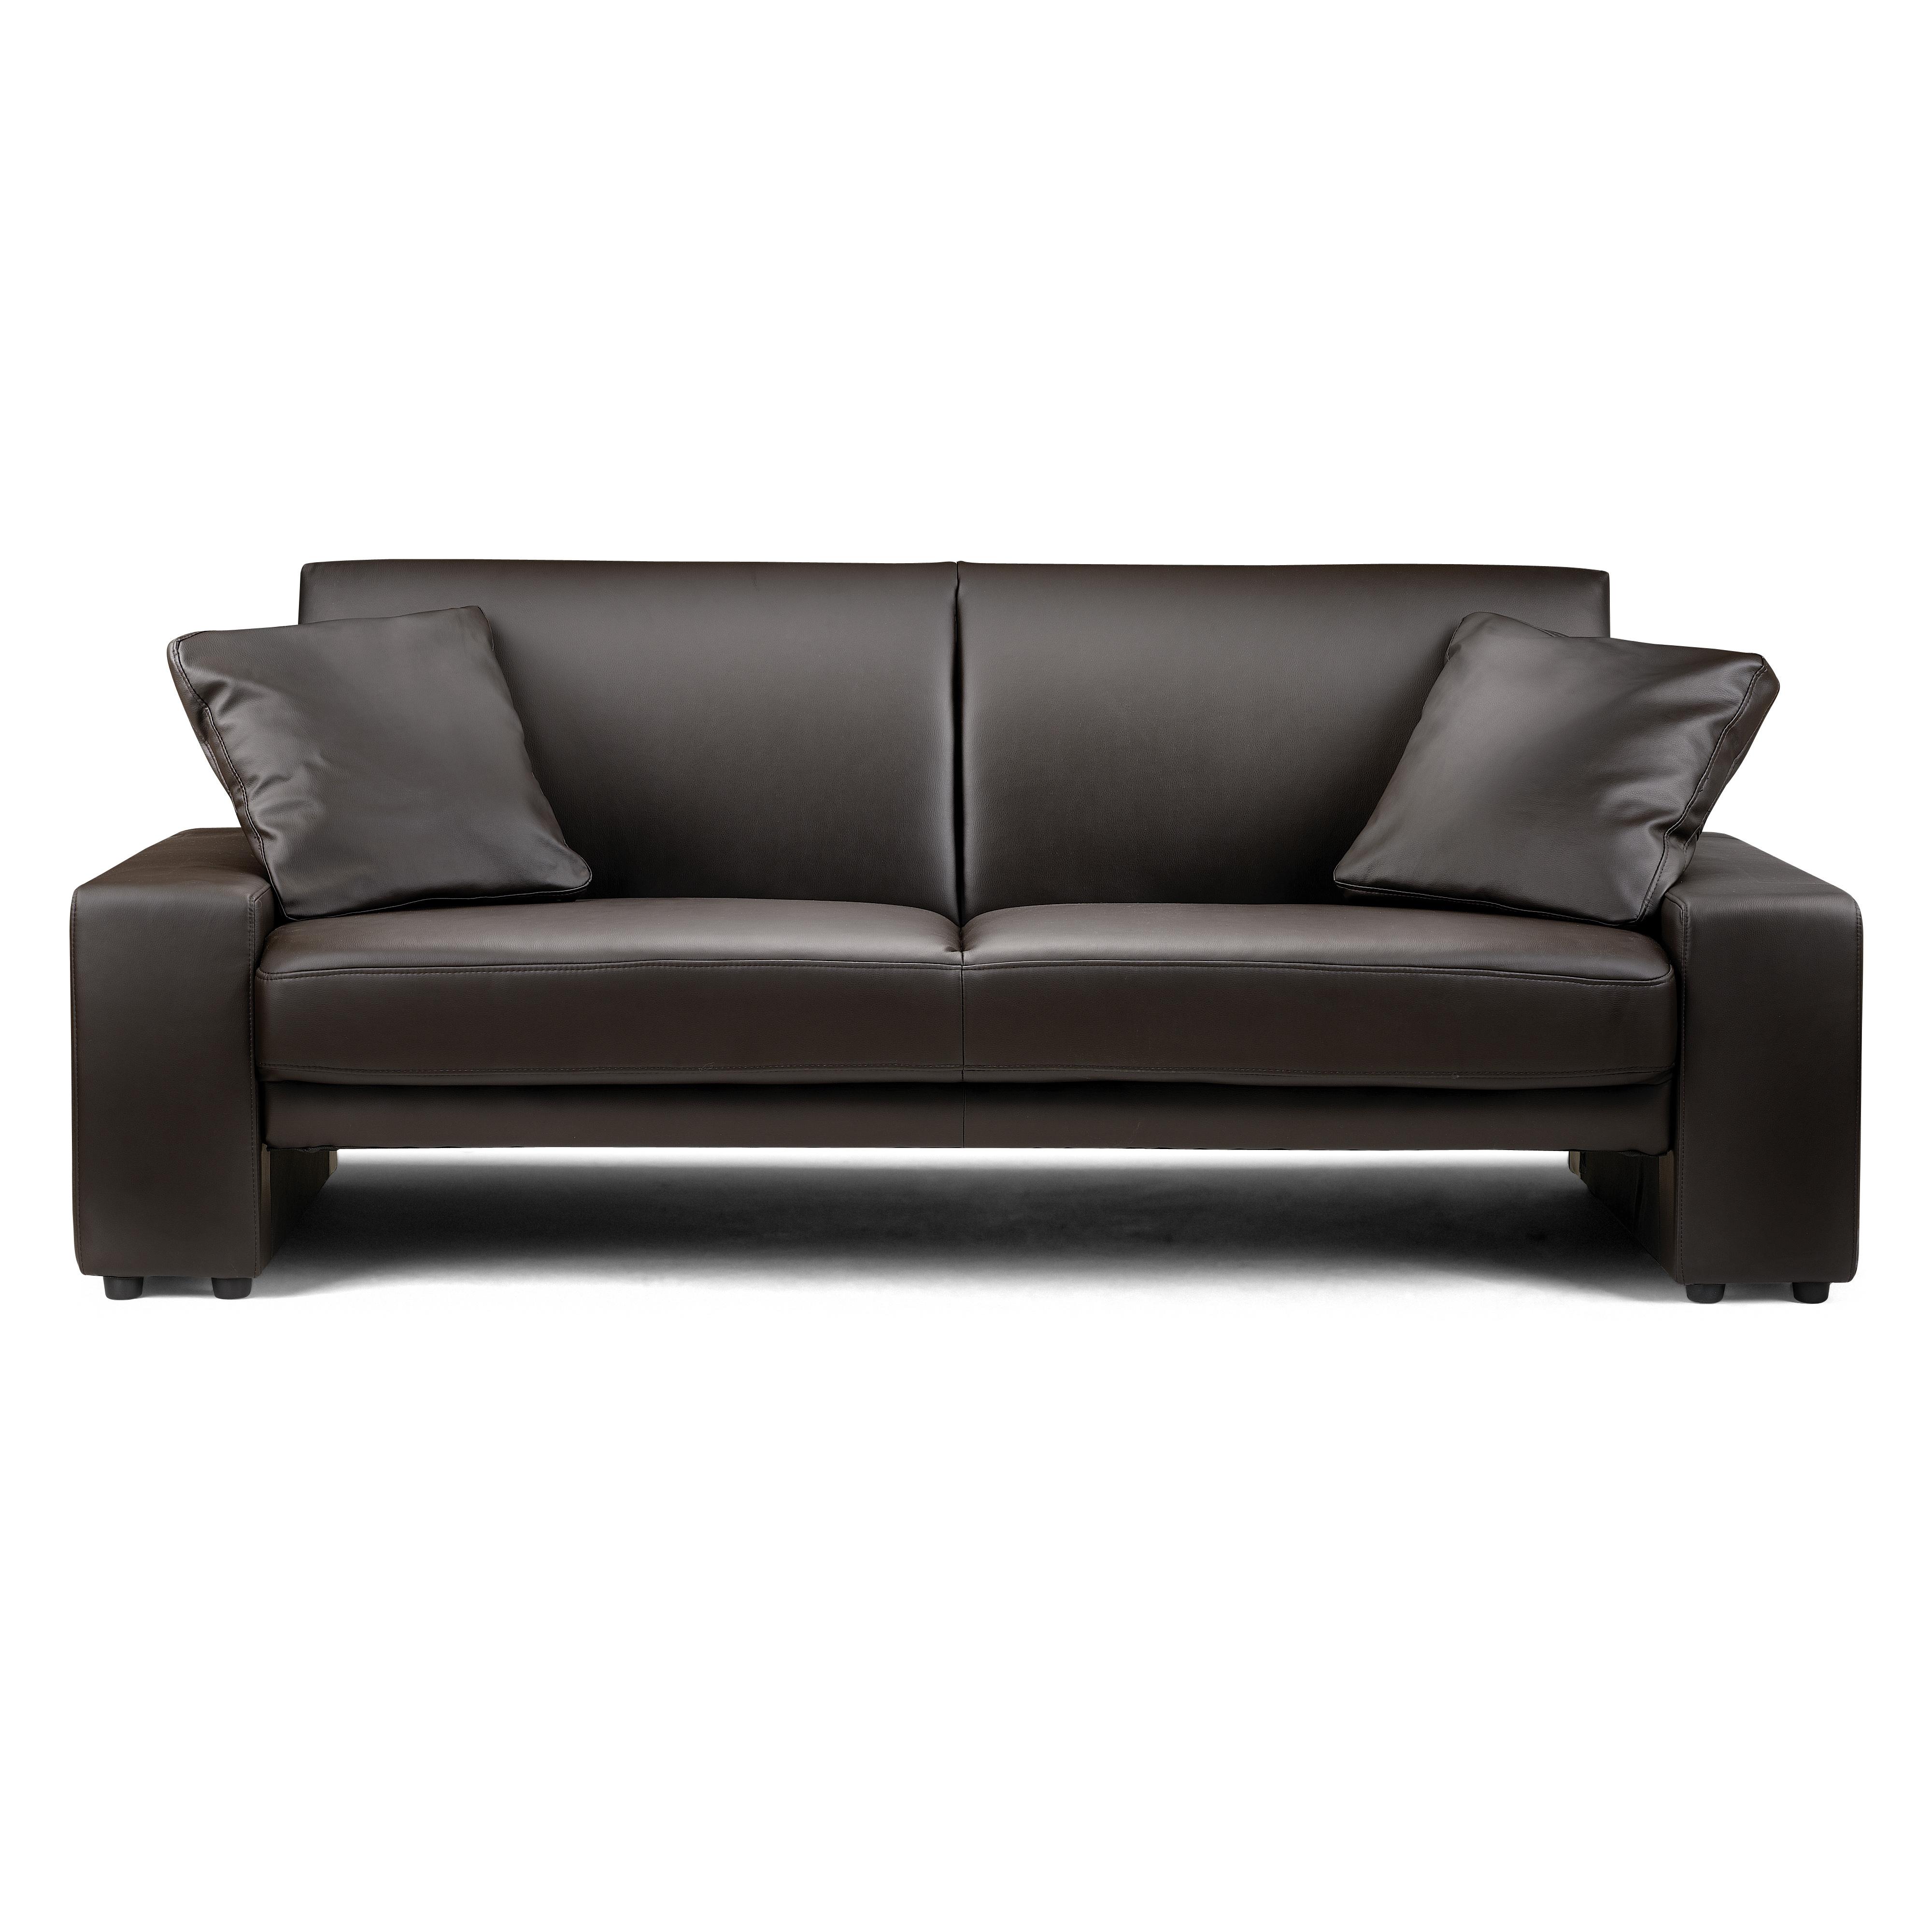 julian bowen supra sofa brown online bed mattress store shops